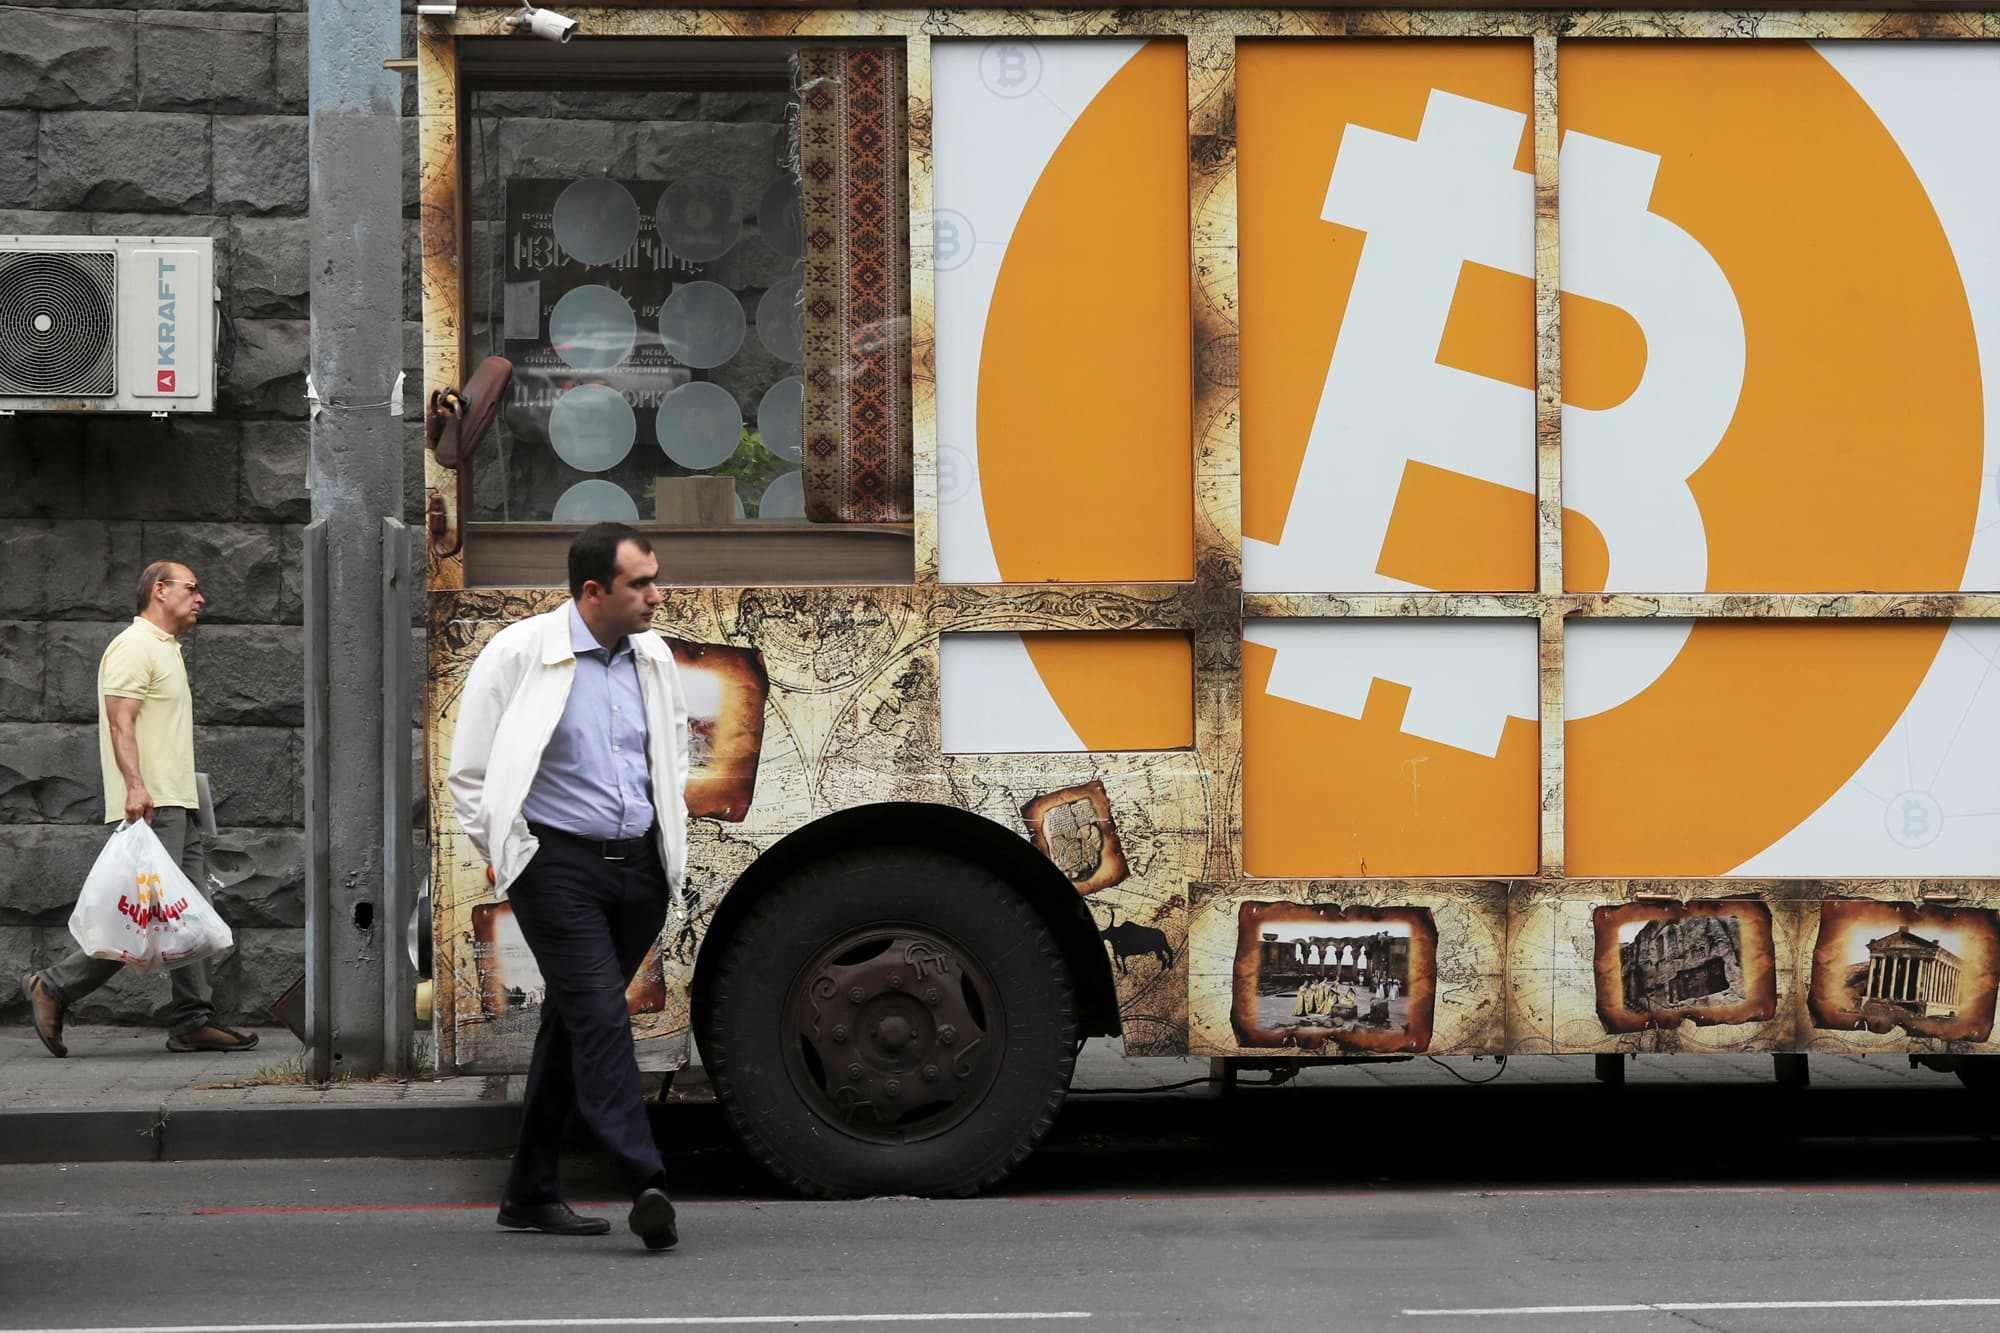 jackson bitcoin plan investors isaiah